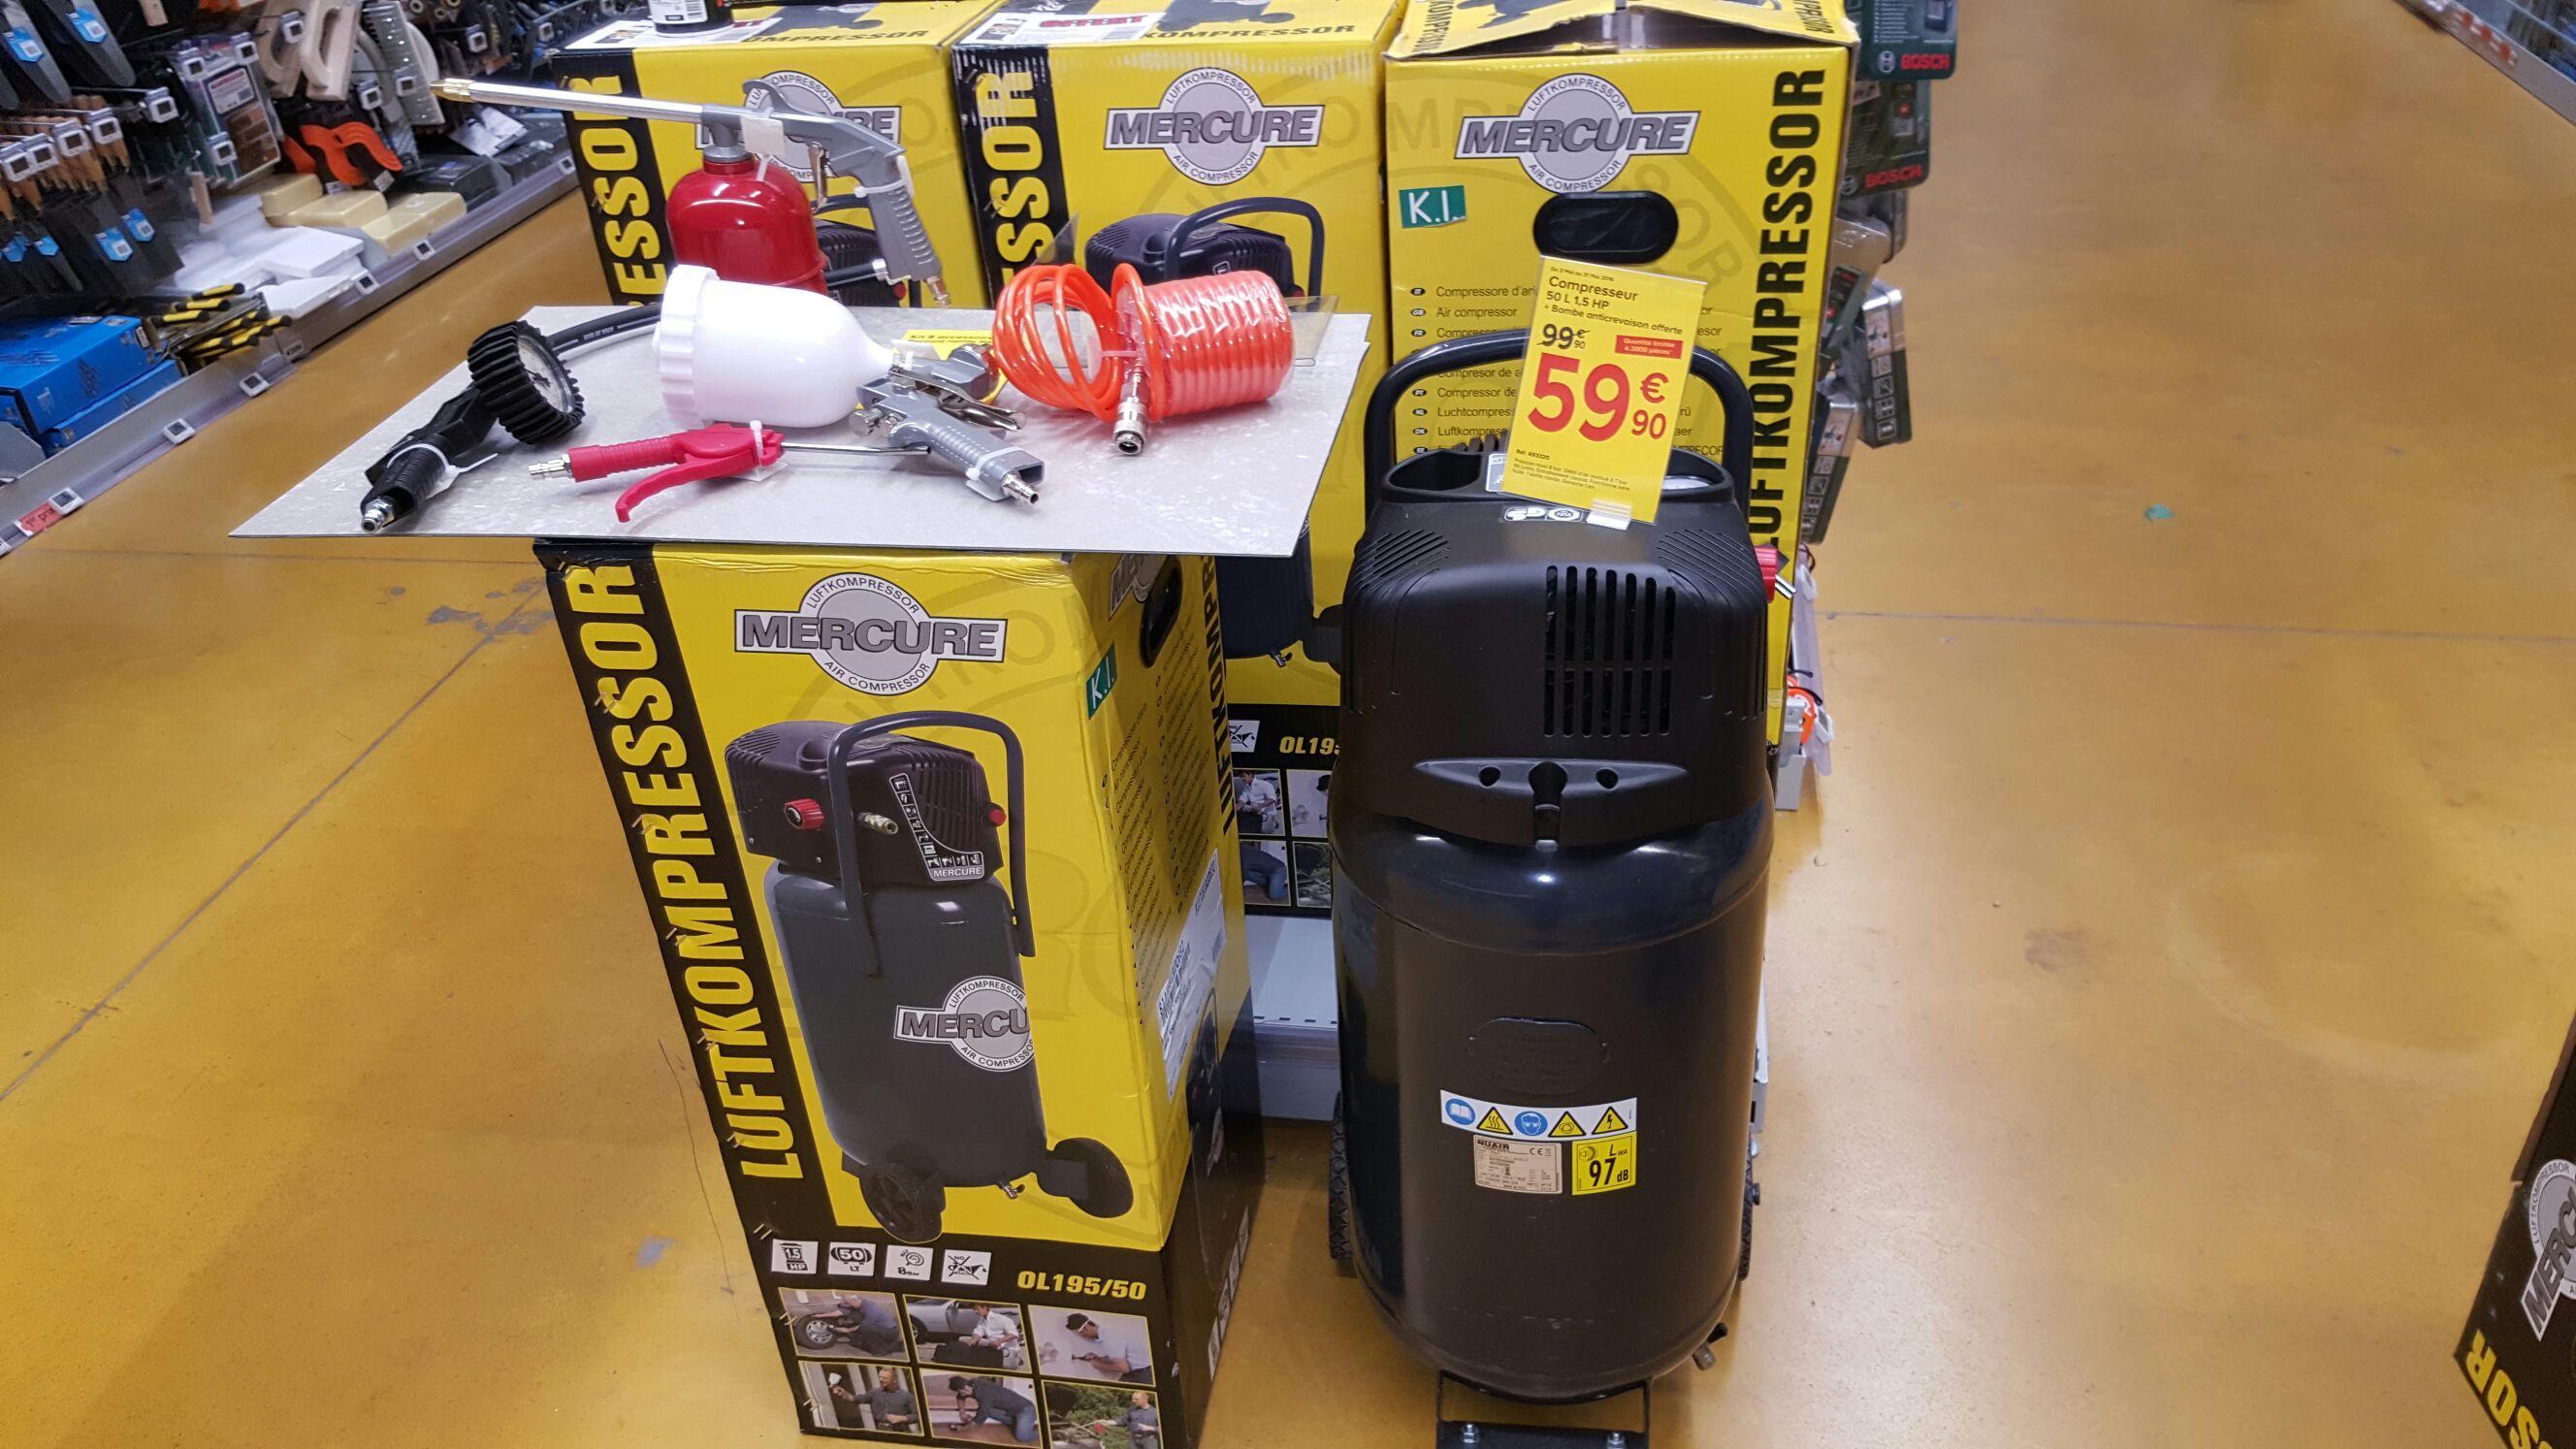 Compresseur Mercure OL195/50 (50 L)